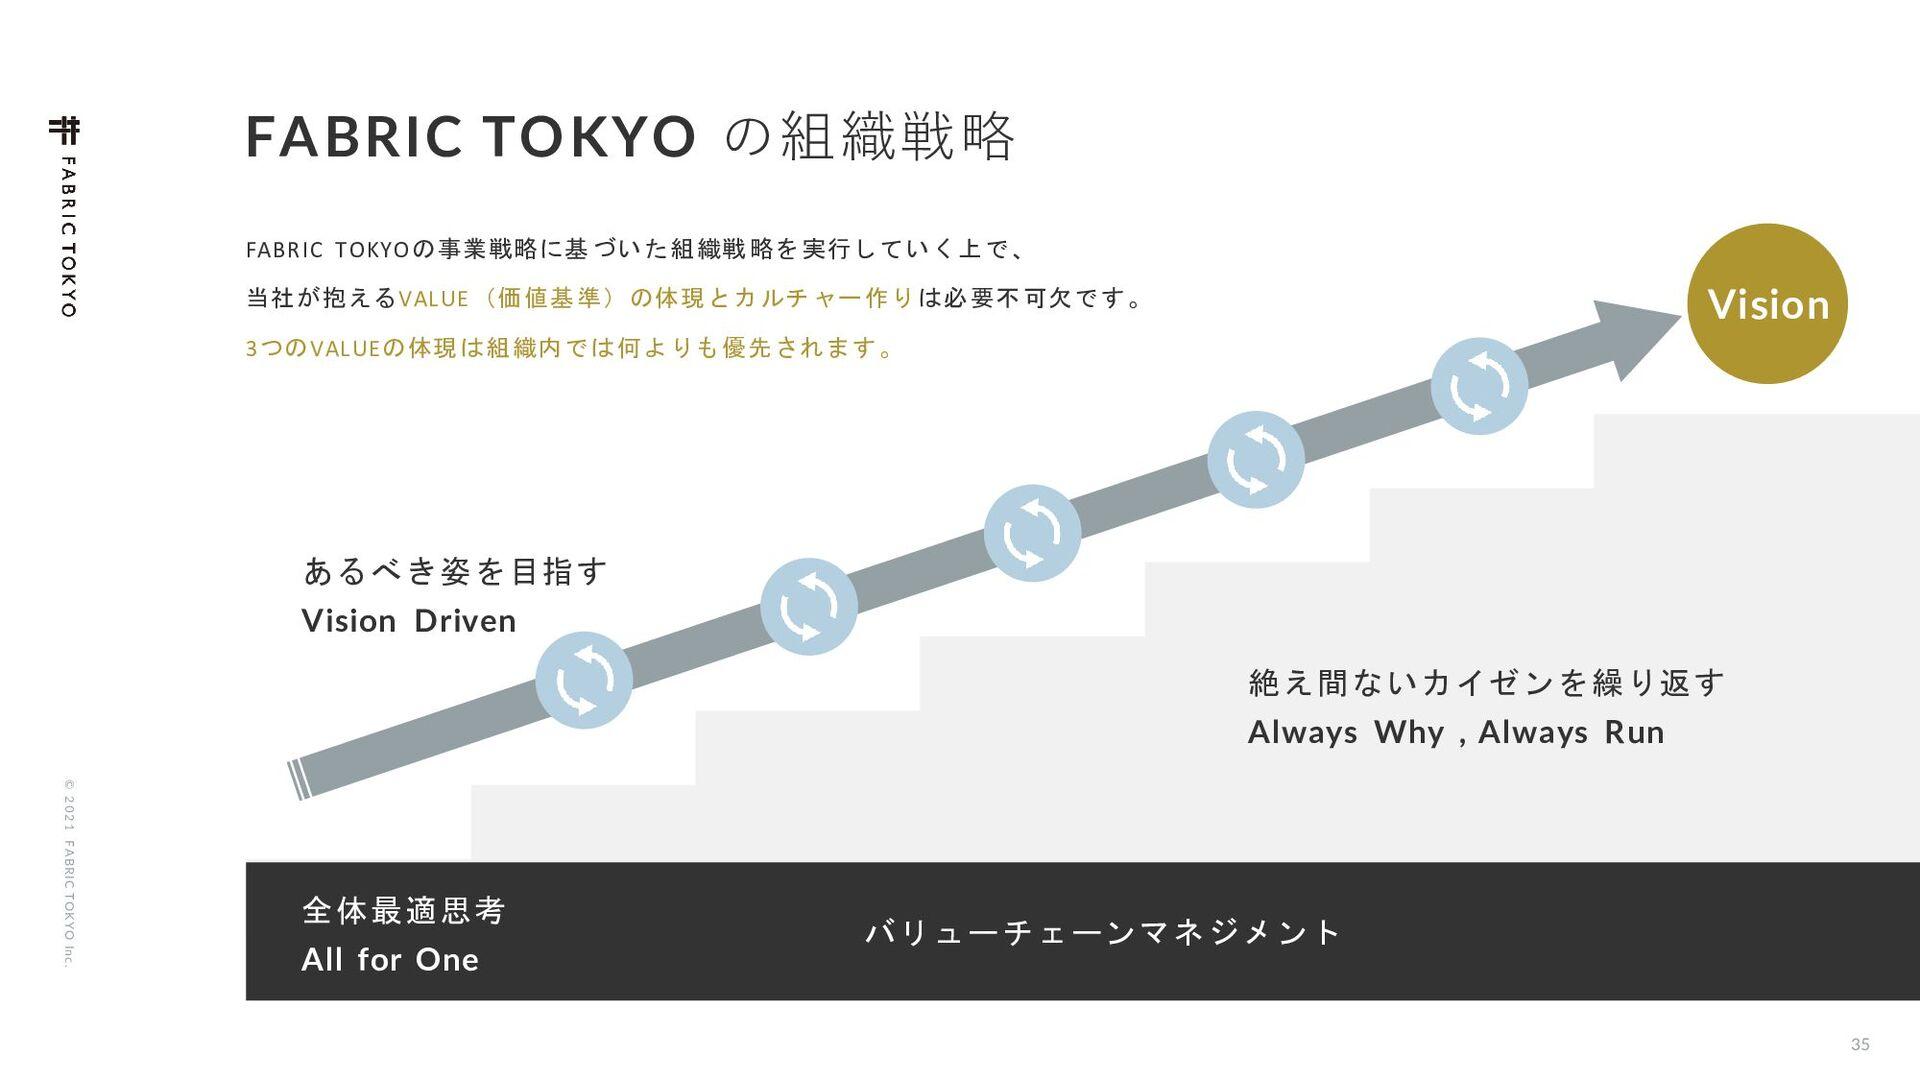 © 2021 FABRIC TOKYO Inc. Χ ϧ ν ϟ ʔ ʹ ͭ ͍ ͯ 04